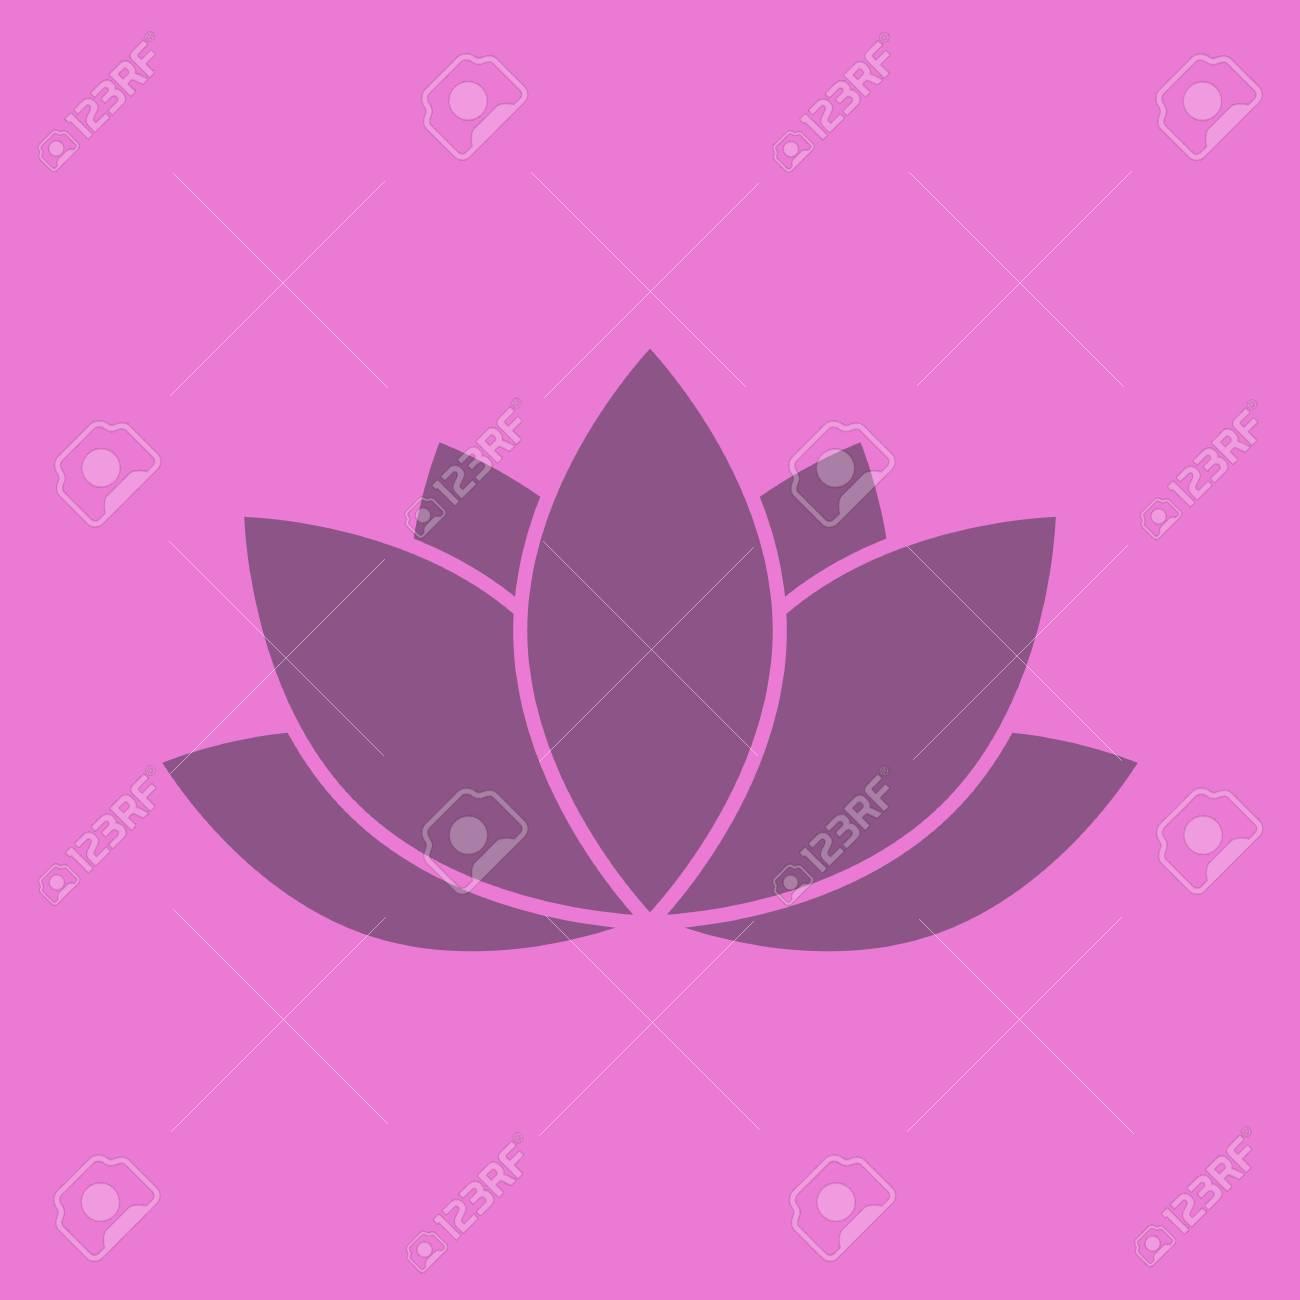 Lotus flower glyph color icon silhouette symbol negative space lotus flower glyph color icon silhouette symbol negative space vector isolated illustration stock izmirmasajfo Images